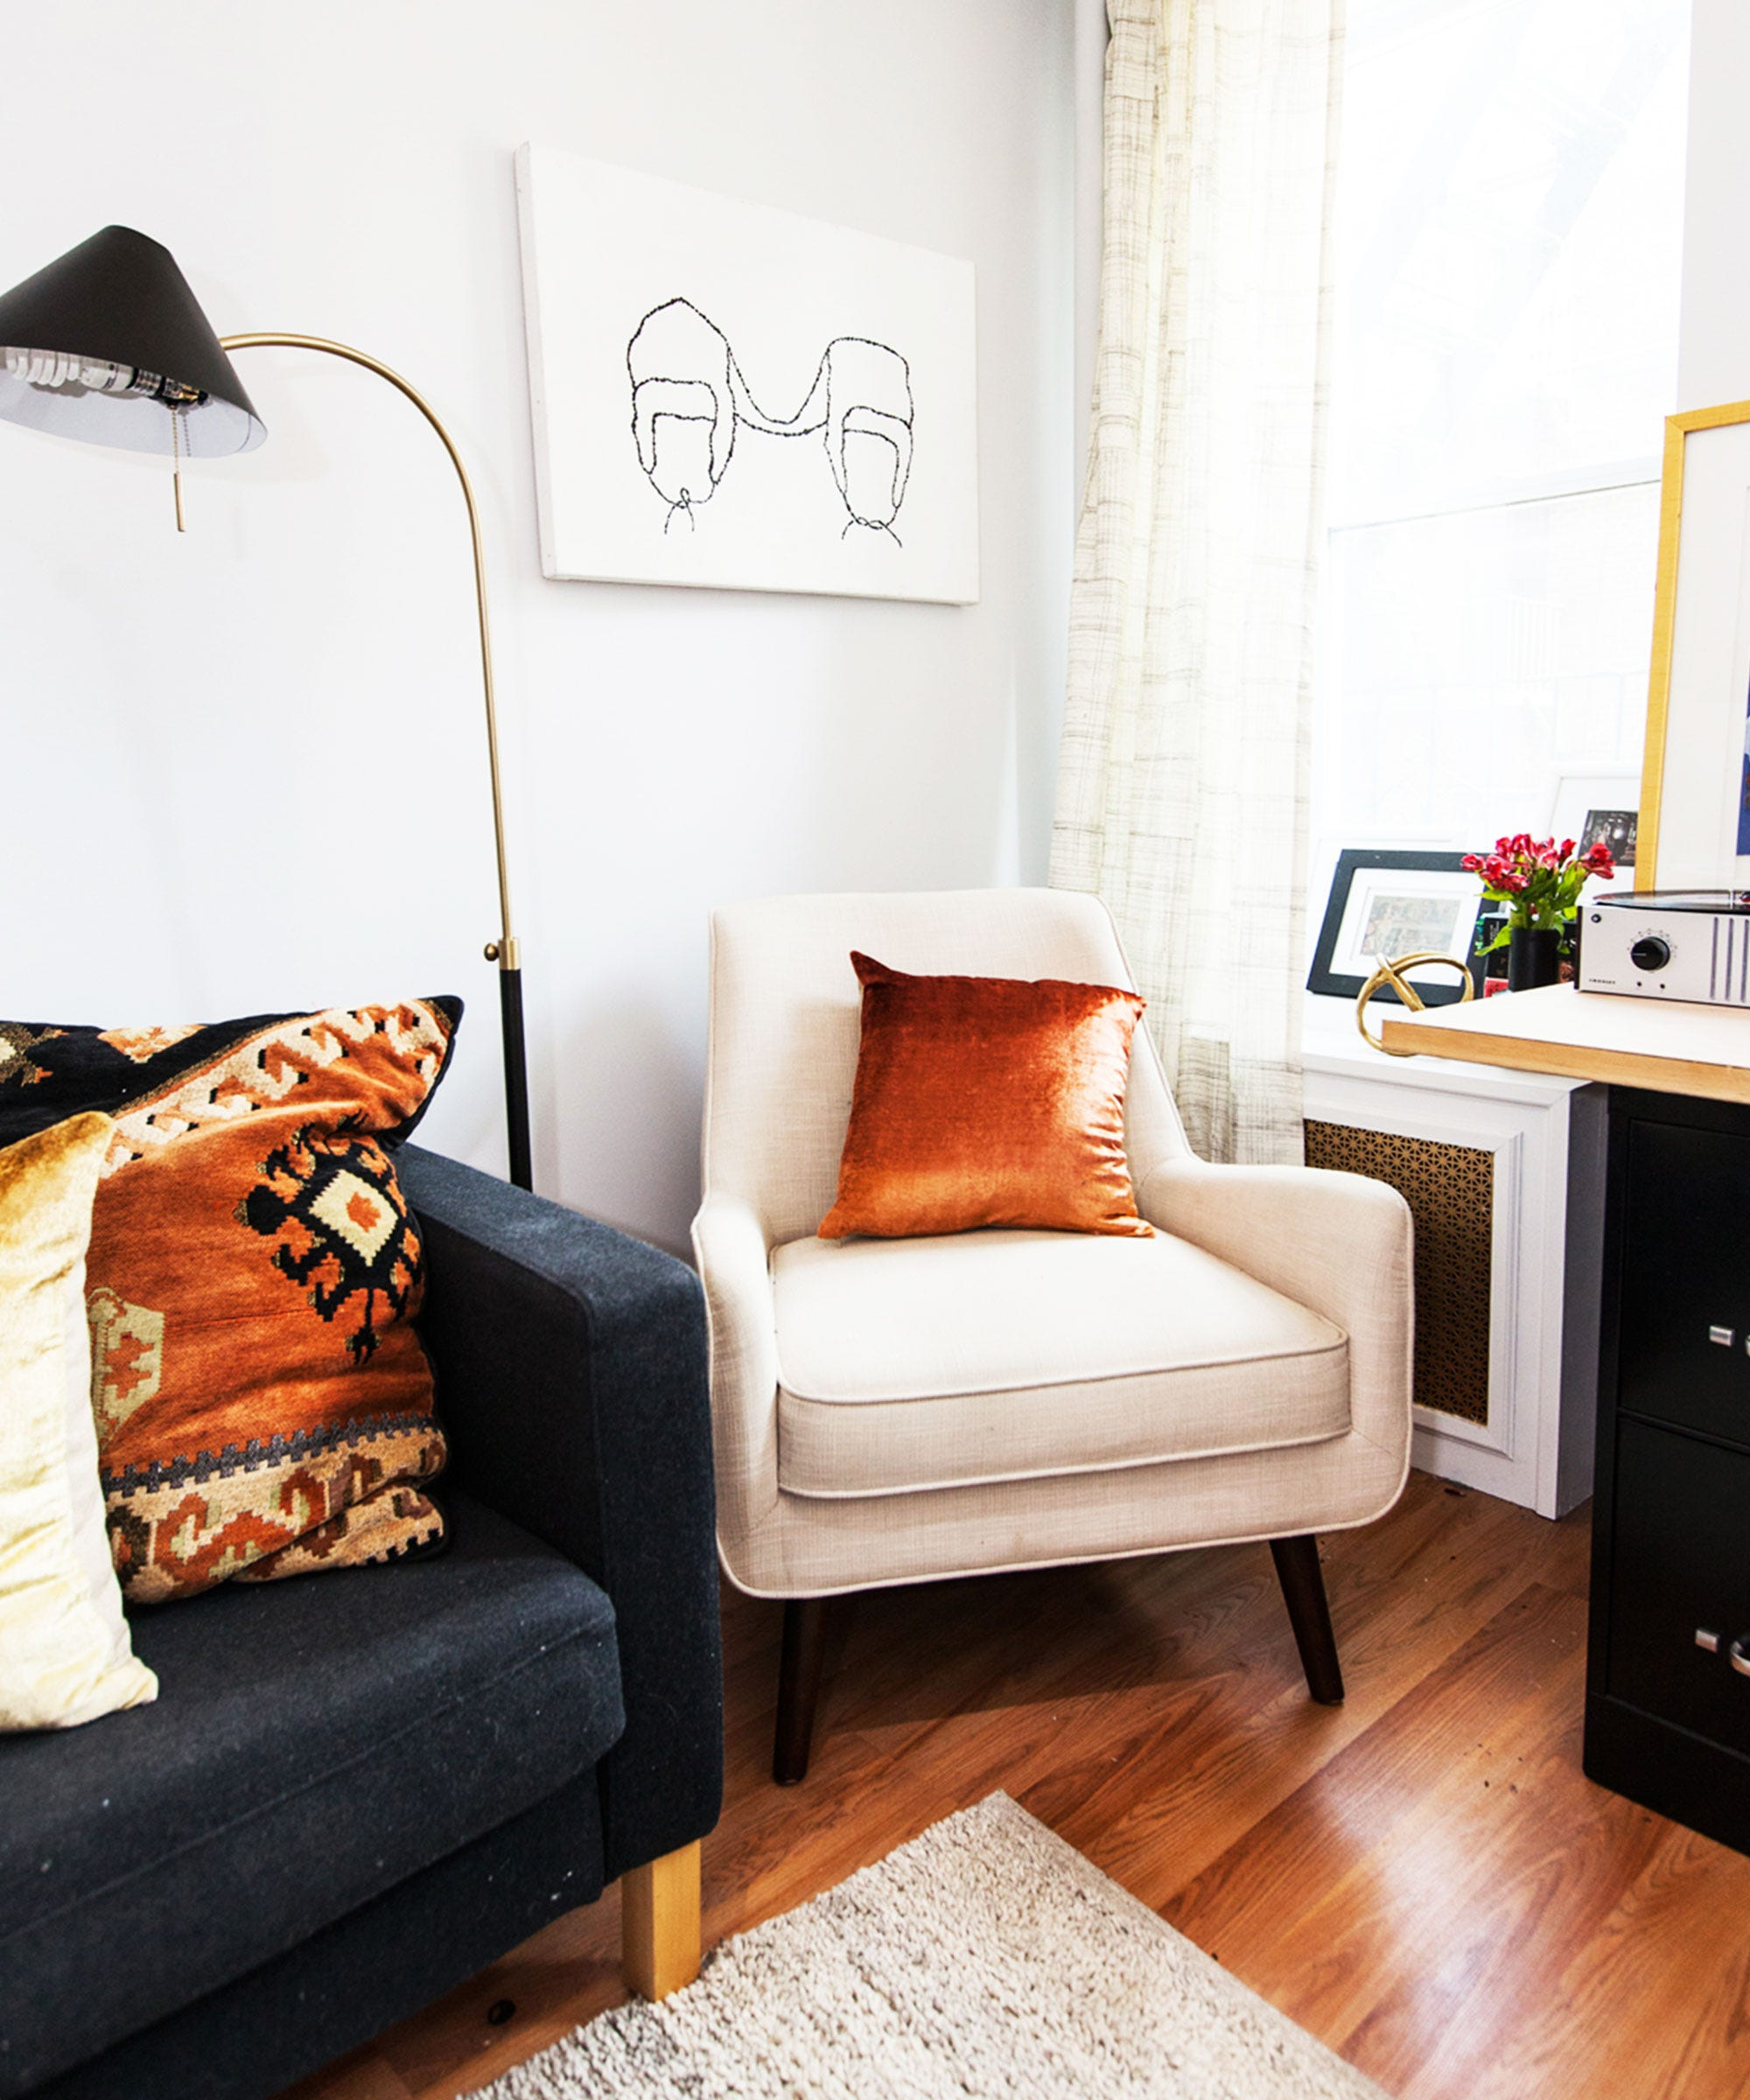 Dorm Room Decor Tips Trends From An Interior Designer